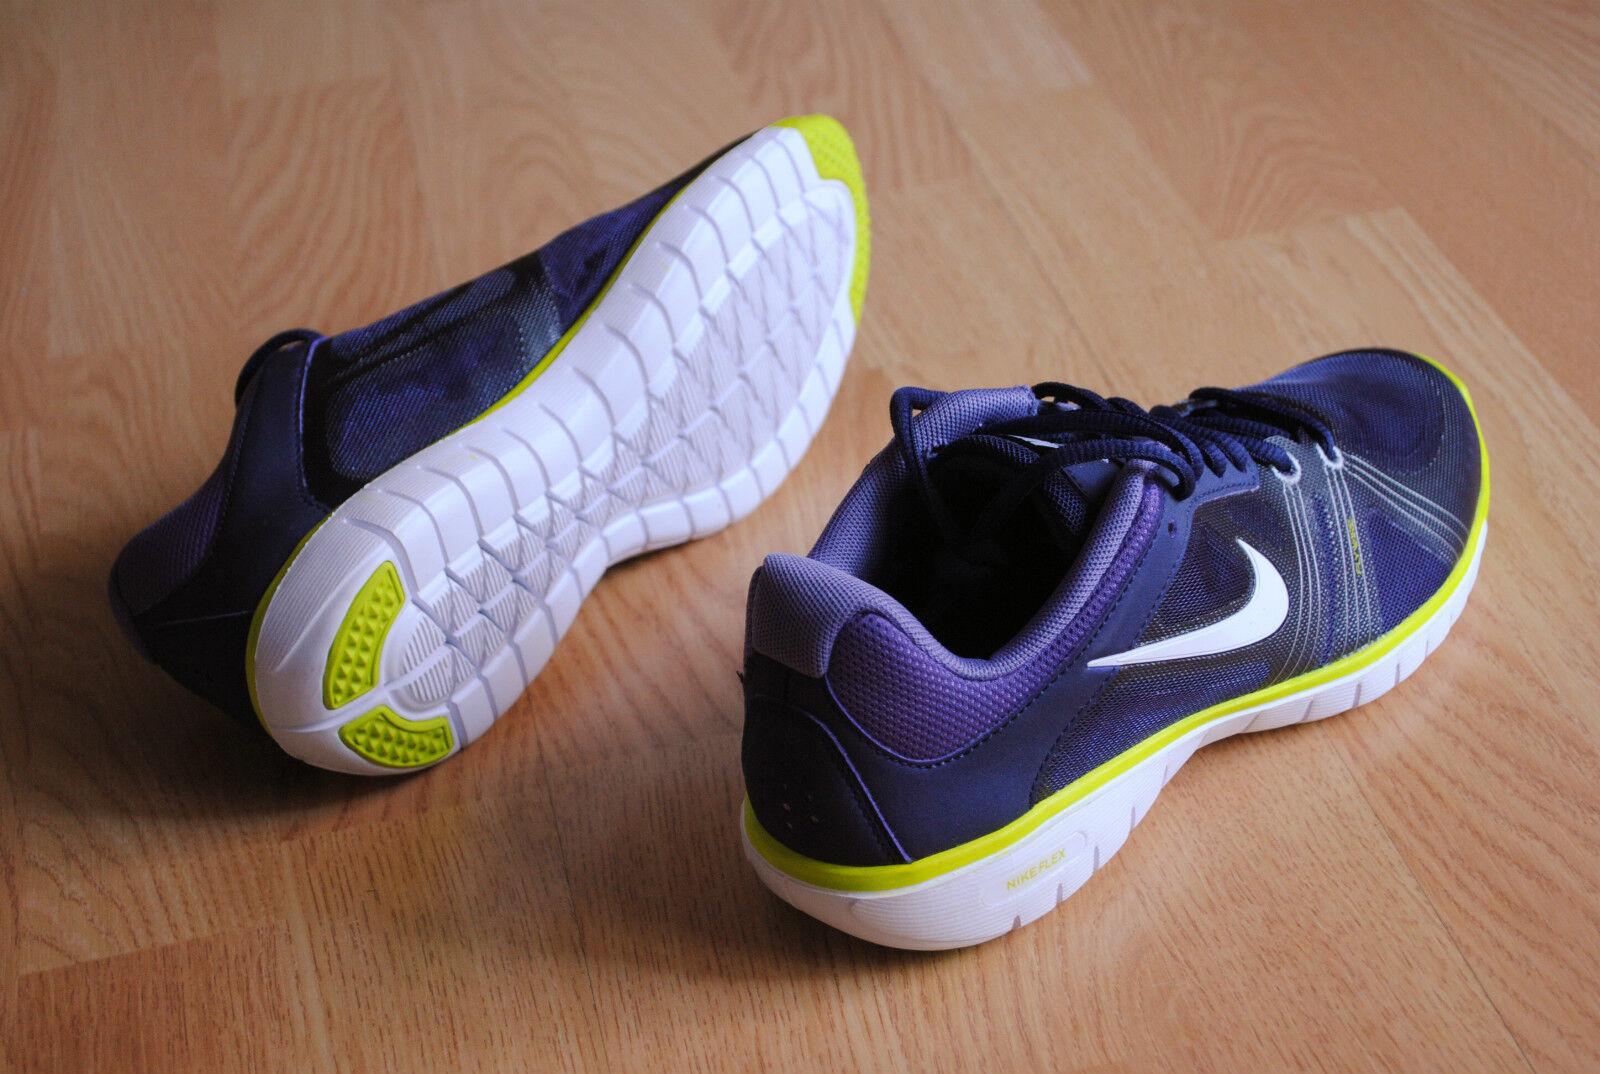 brand new 343f7 a8749 Nike Movimiento Ajuste Womens gr 38 - AEROBIC Free flextrainer  Entrenamiento Luz b4beae - dequijotesyrugby.es